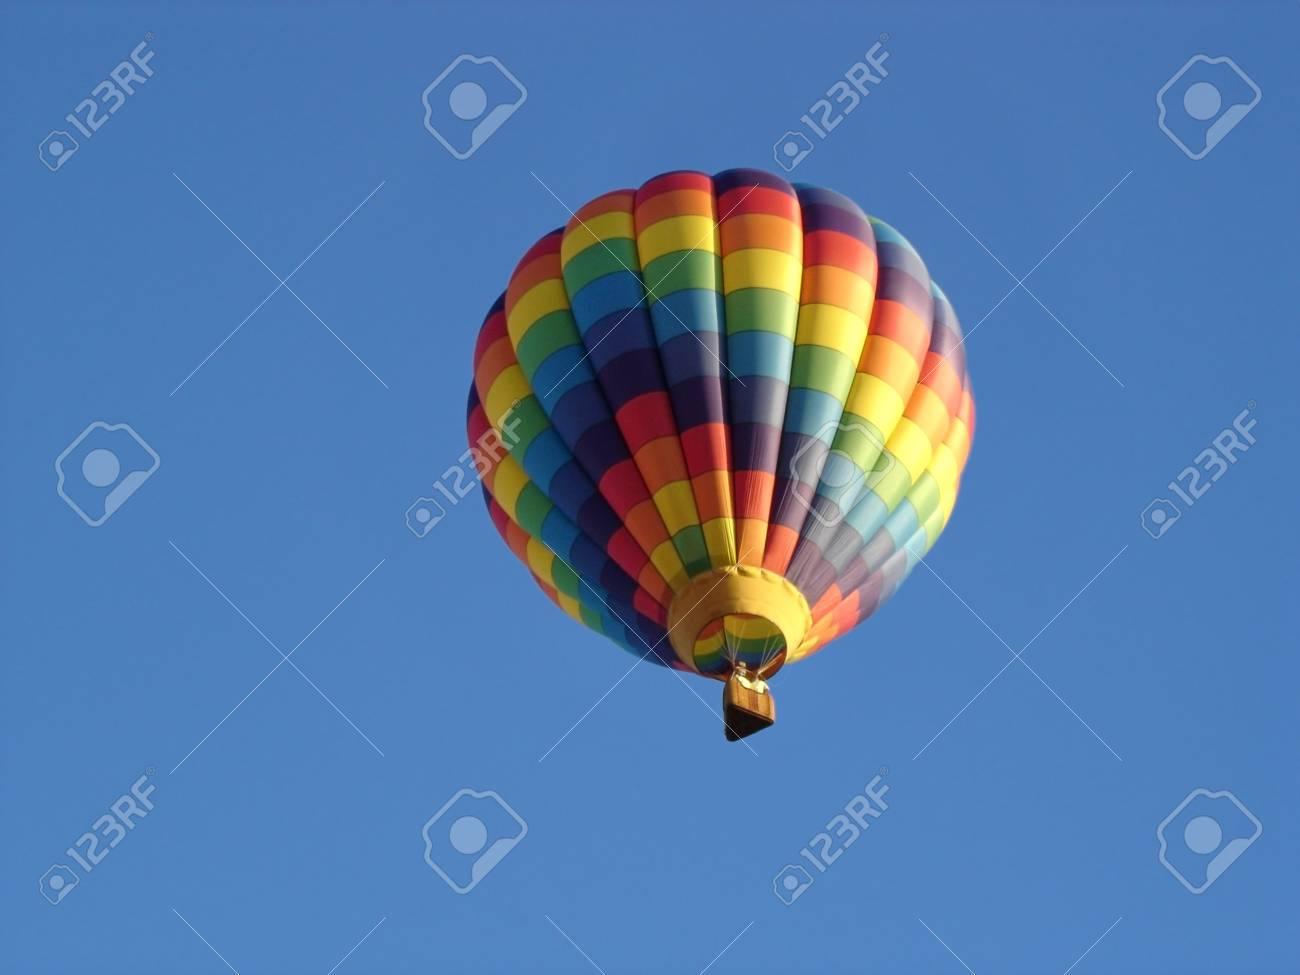 Hot Air Balloon Stock Photo - 3670238